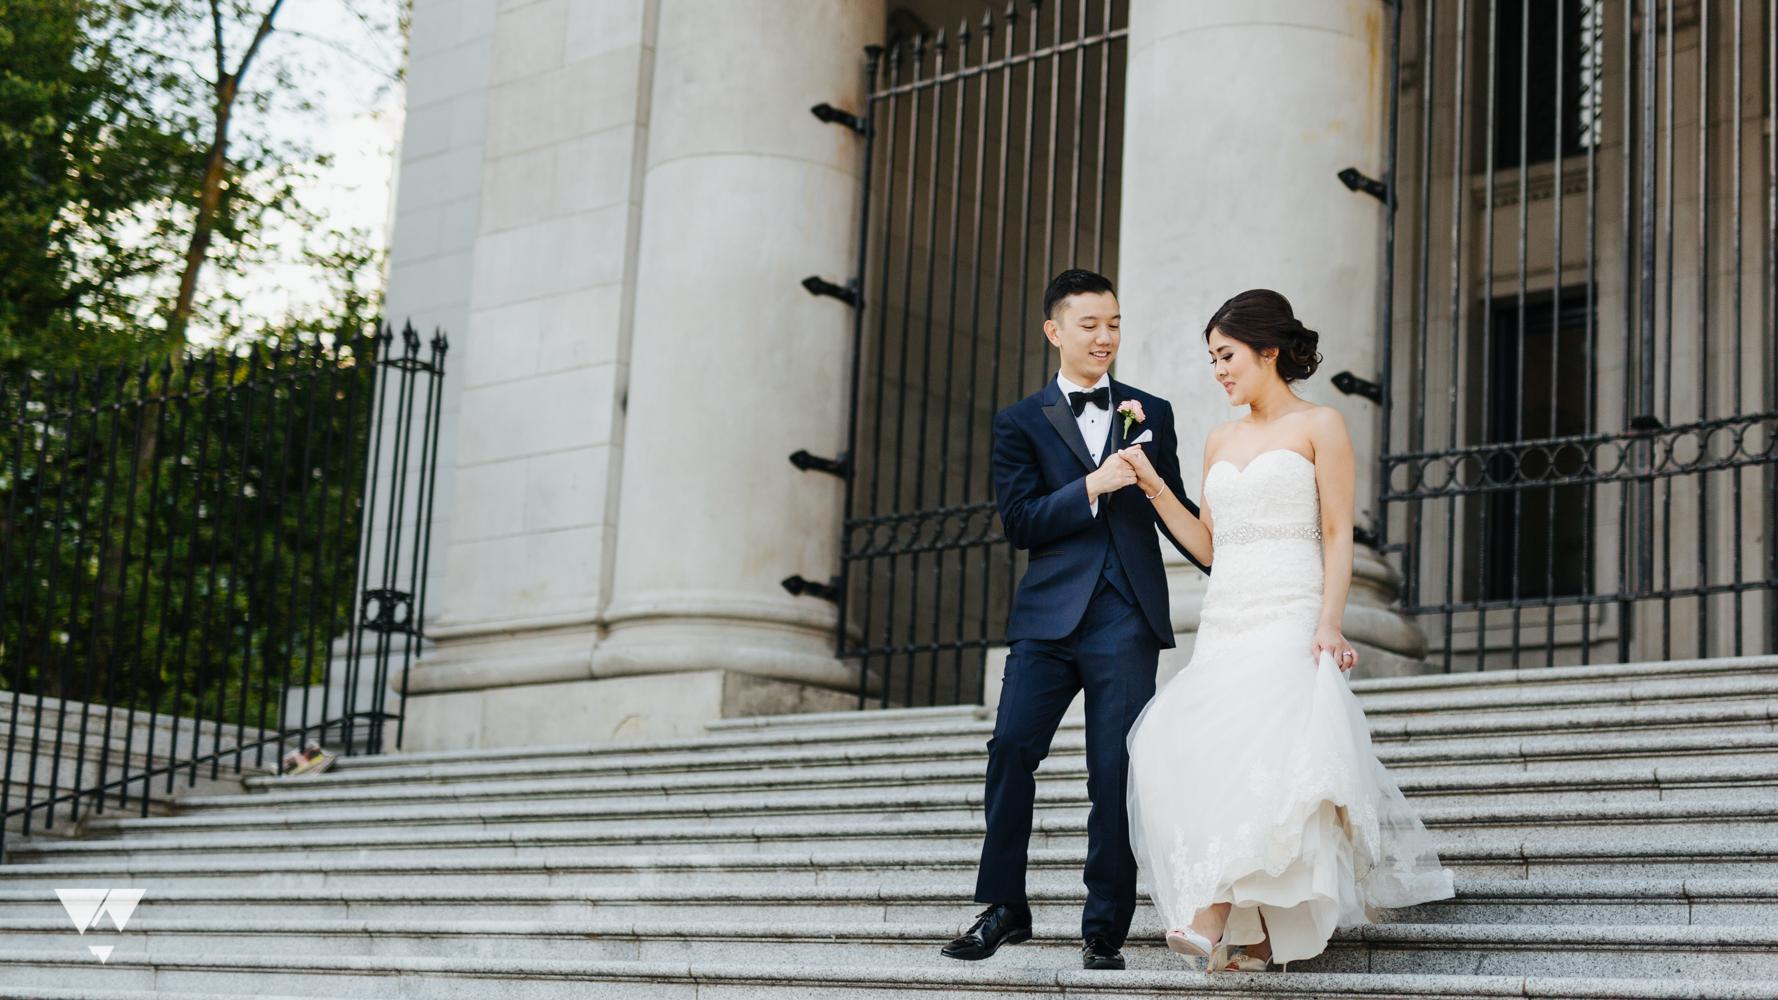 herafilms_wedding_lynn_jeff_hera_selects_web-48.jpg